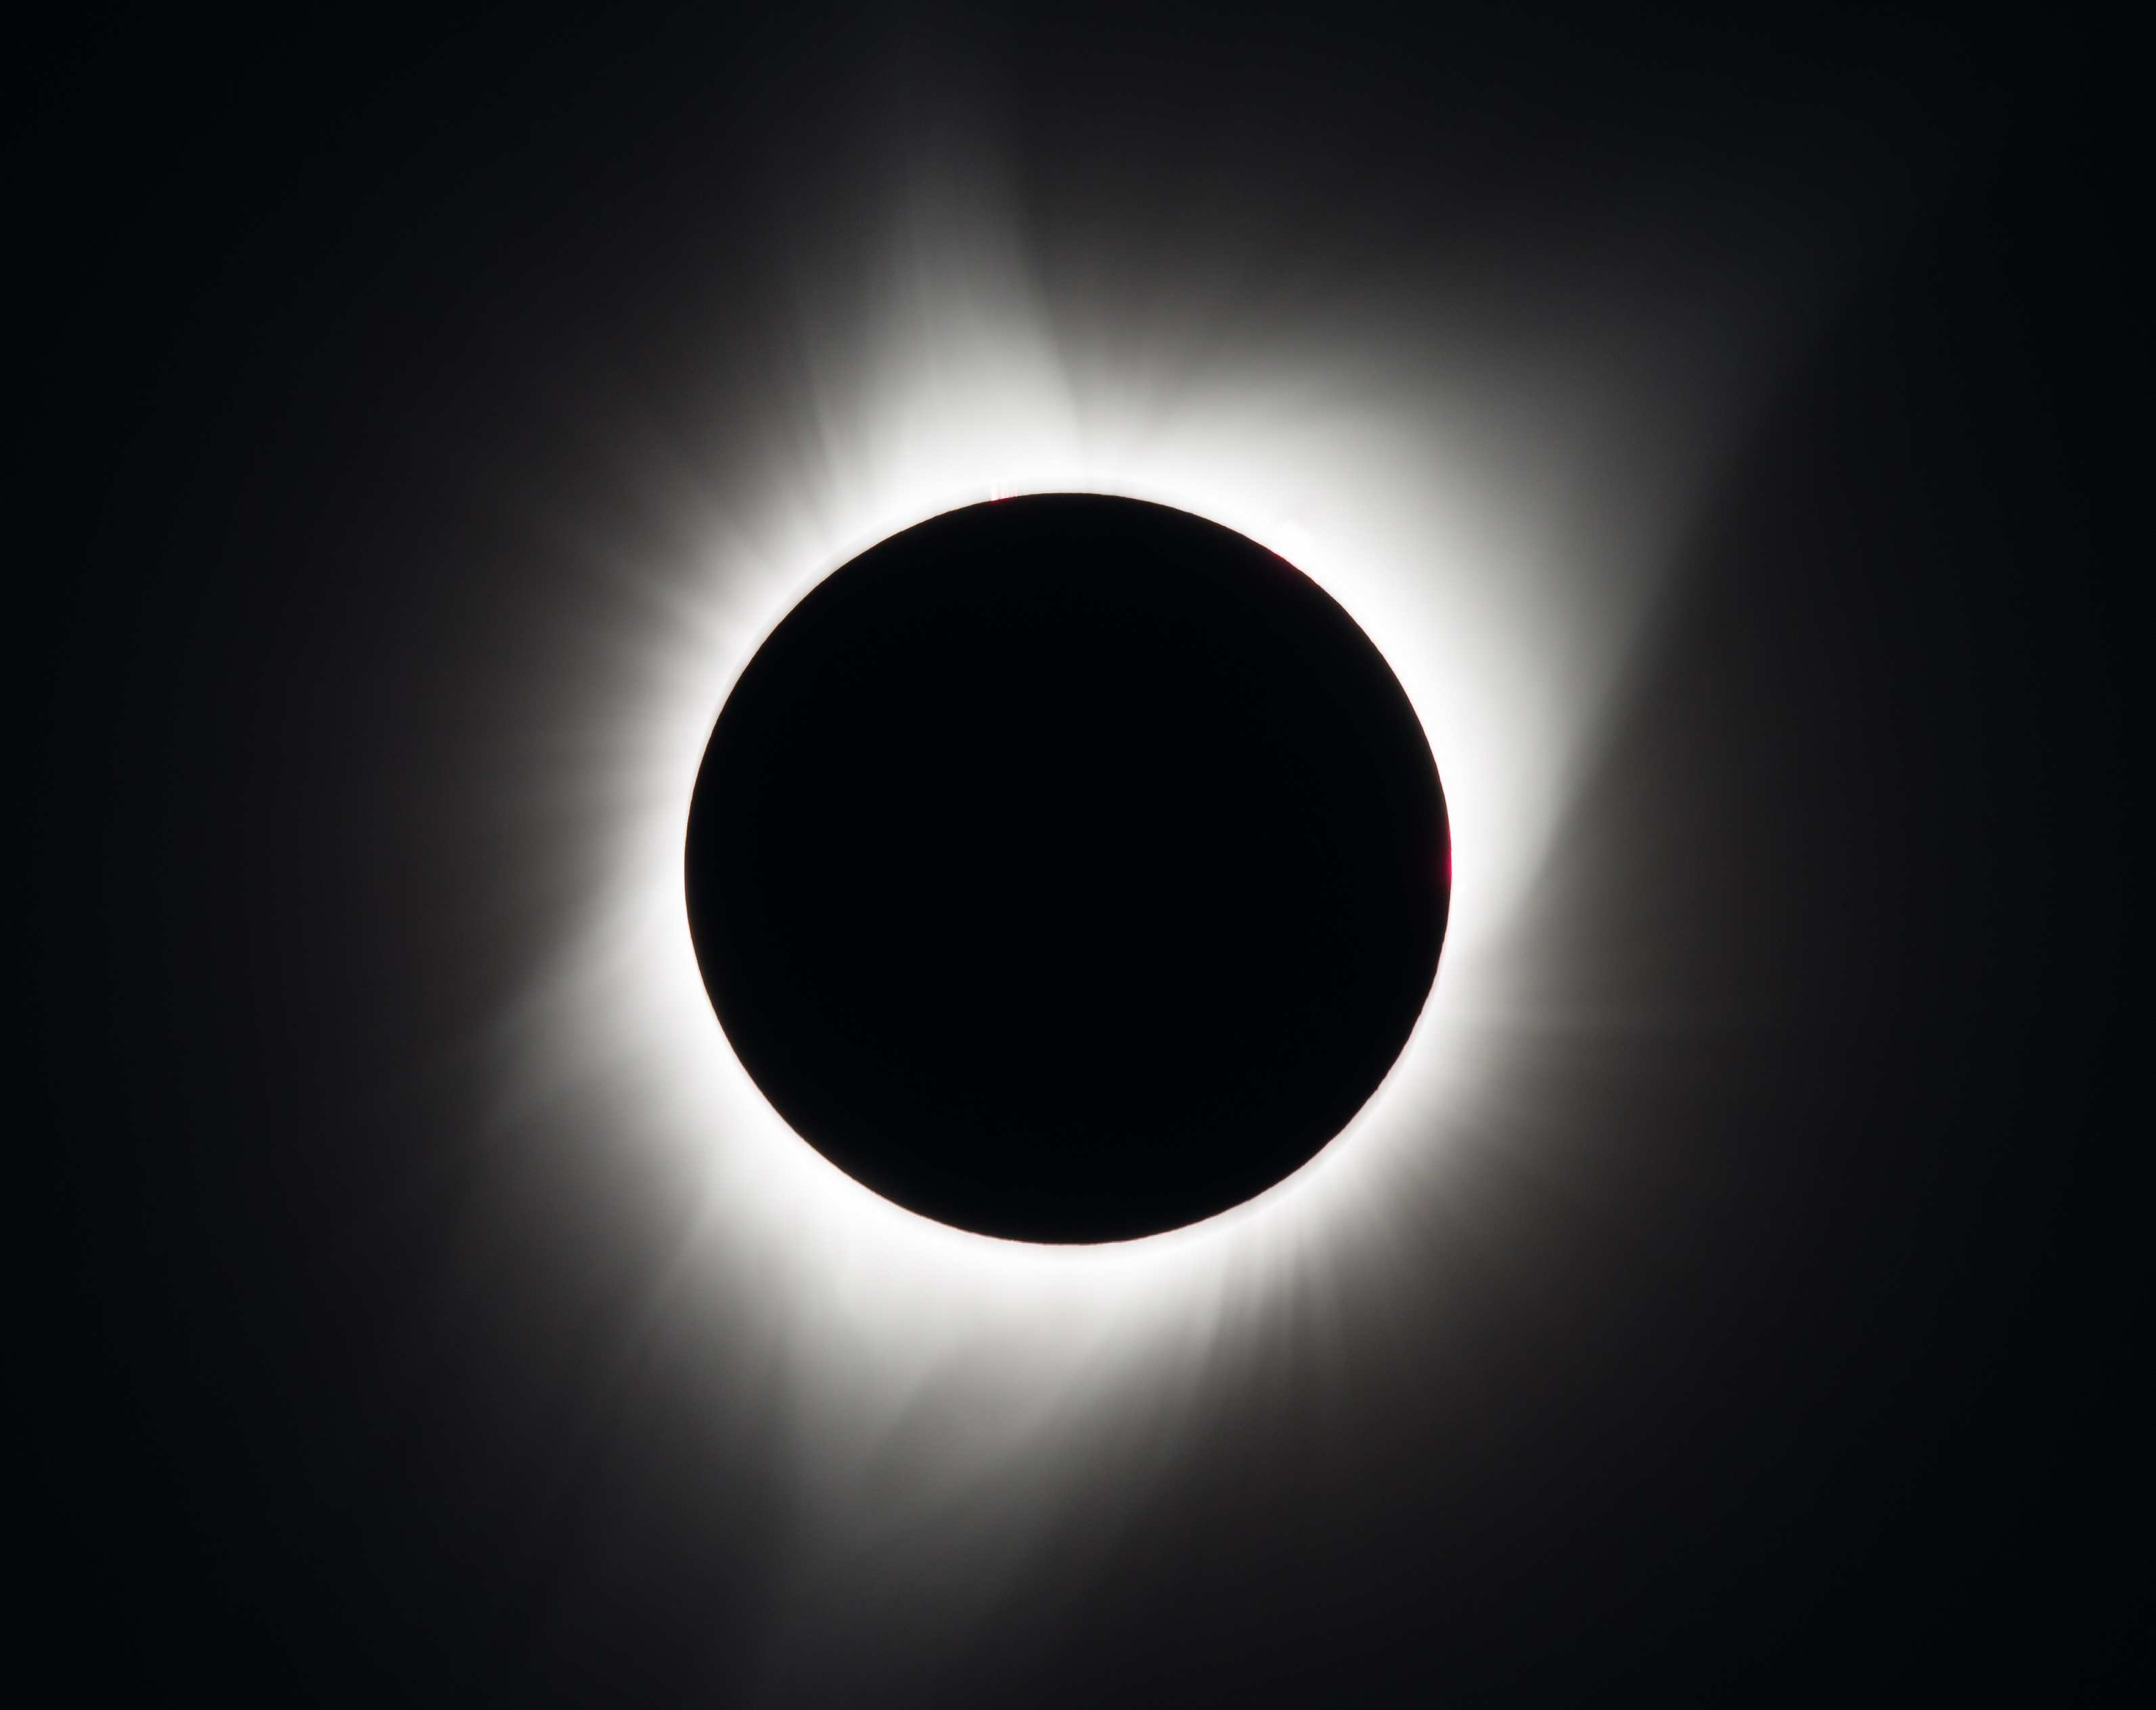 Black Hole Animated Wallpaper 2017 Total Solar Eclipse Nasa